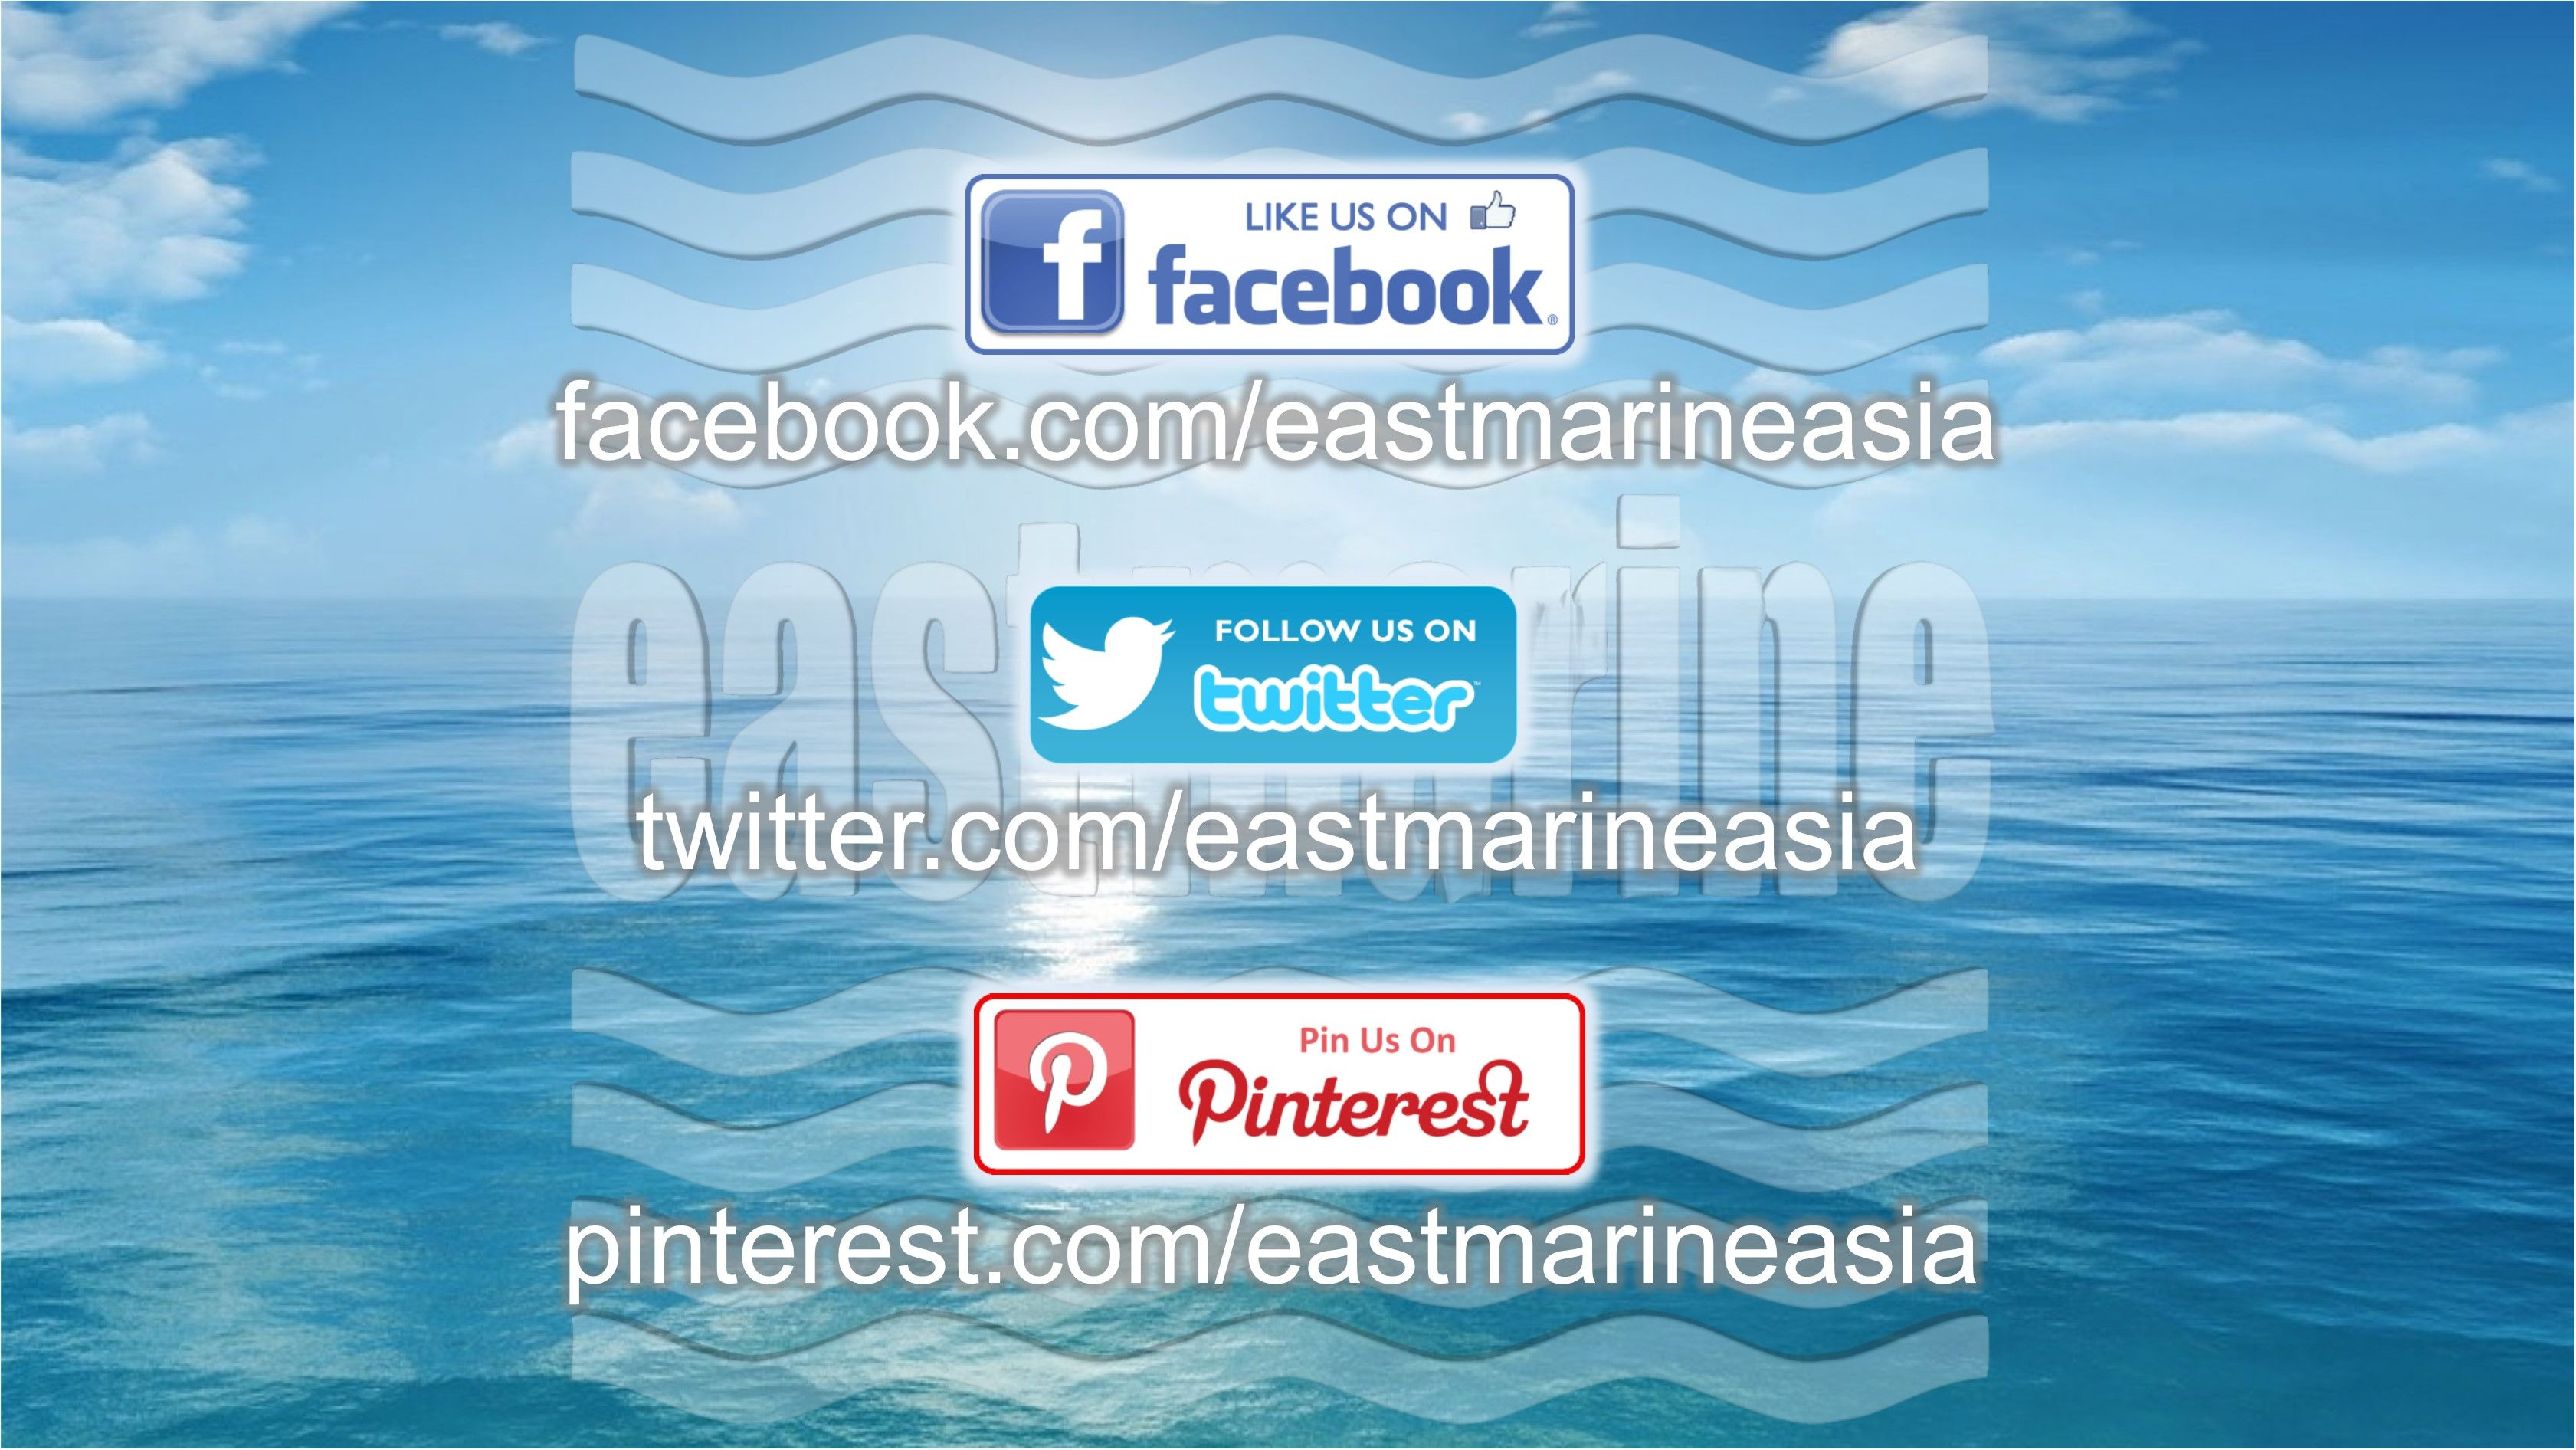 Like Us @ facebook.com/eastmarineasia Follow Us @ twitter.com/eastmarineasia Pin Us @ pinterest.com/eastmarineasia  #EastMarine eastmarineasia.com